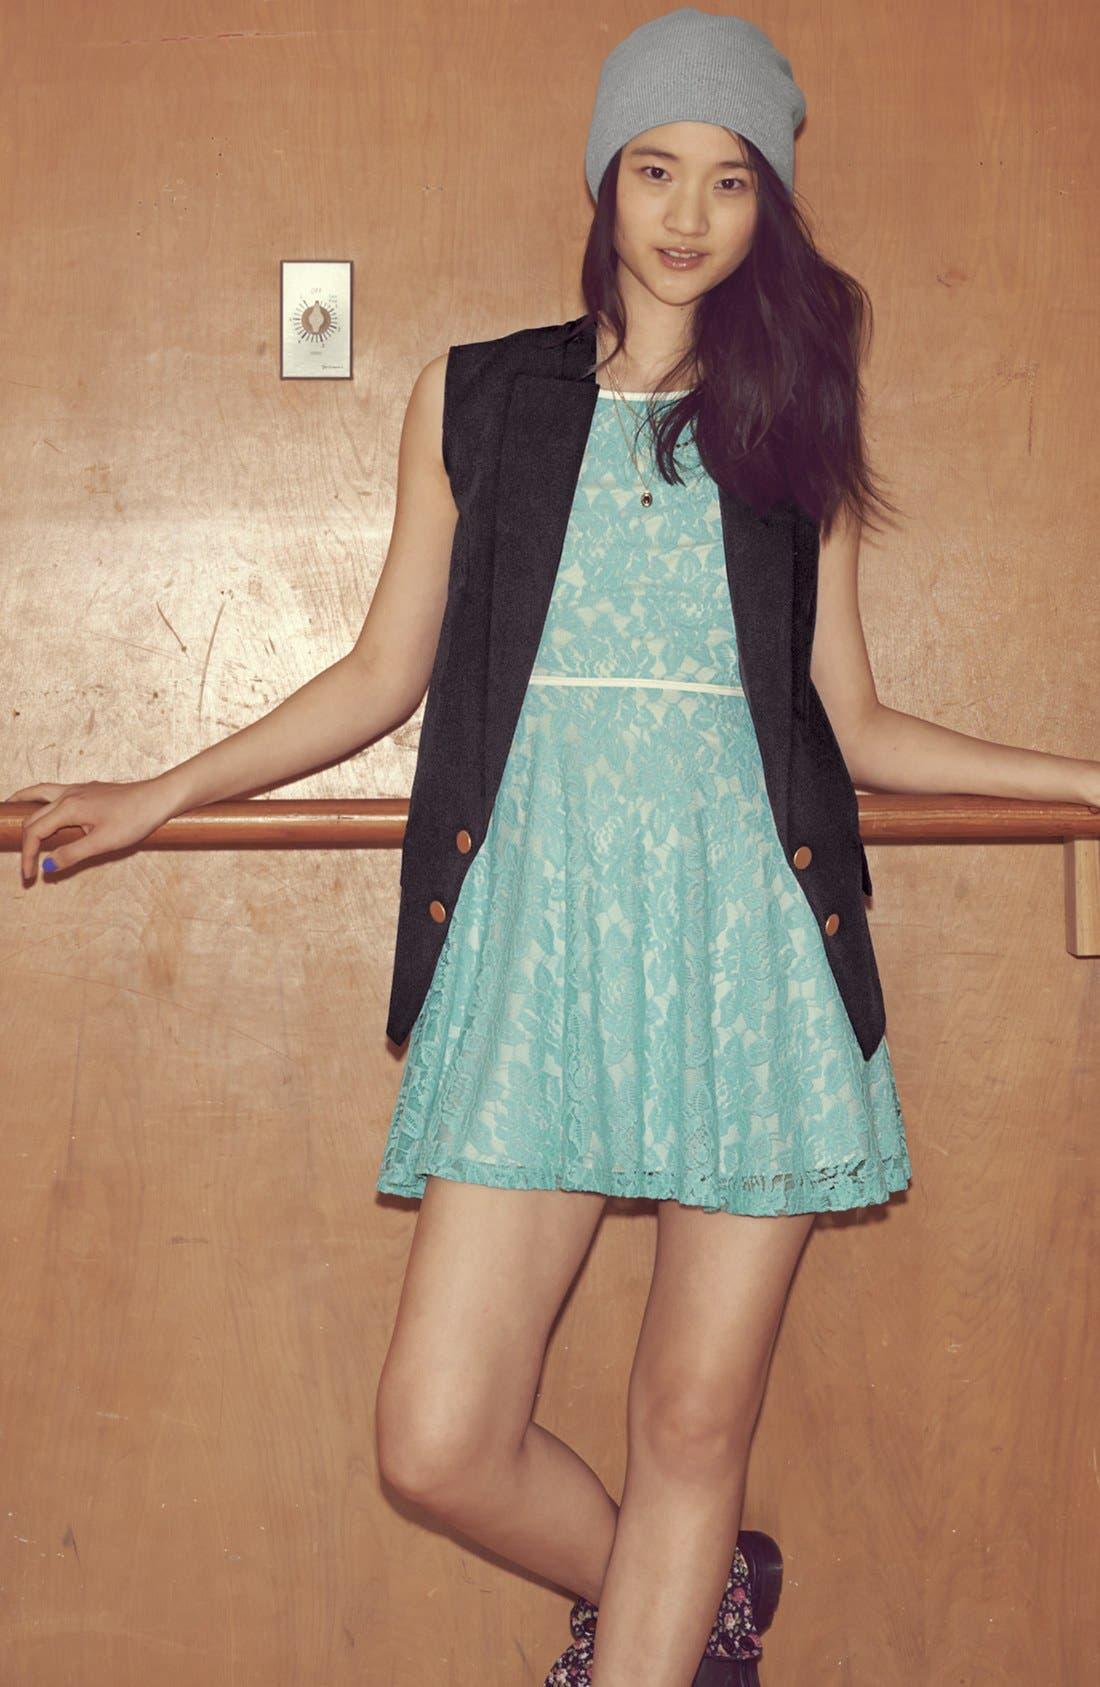 Alternate Image 1 Selected - Stoosh Vest & Lush Dress